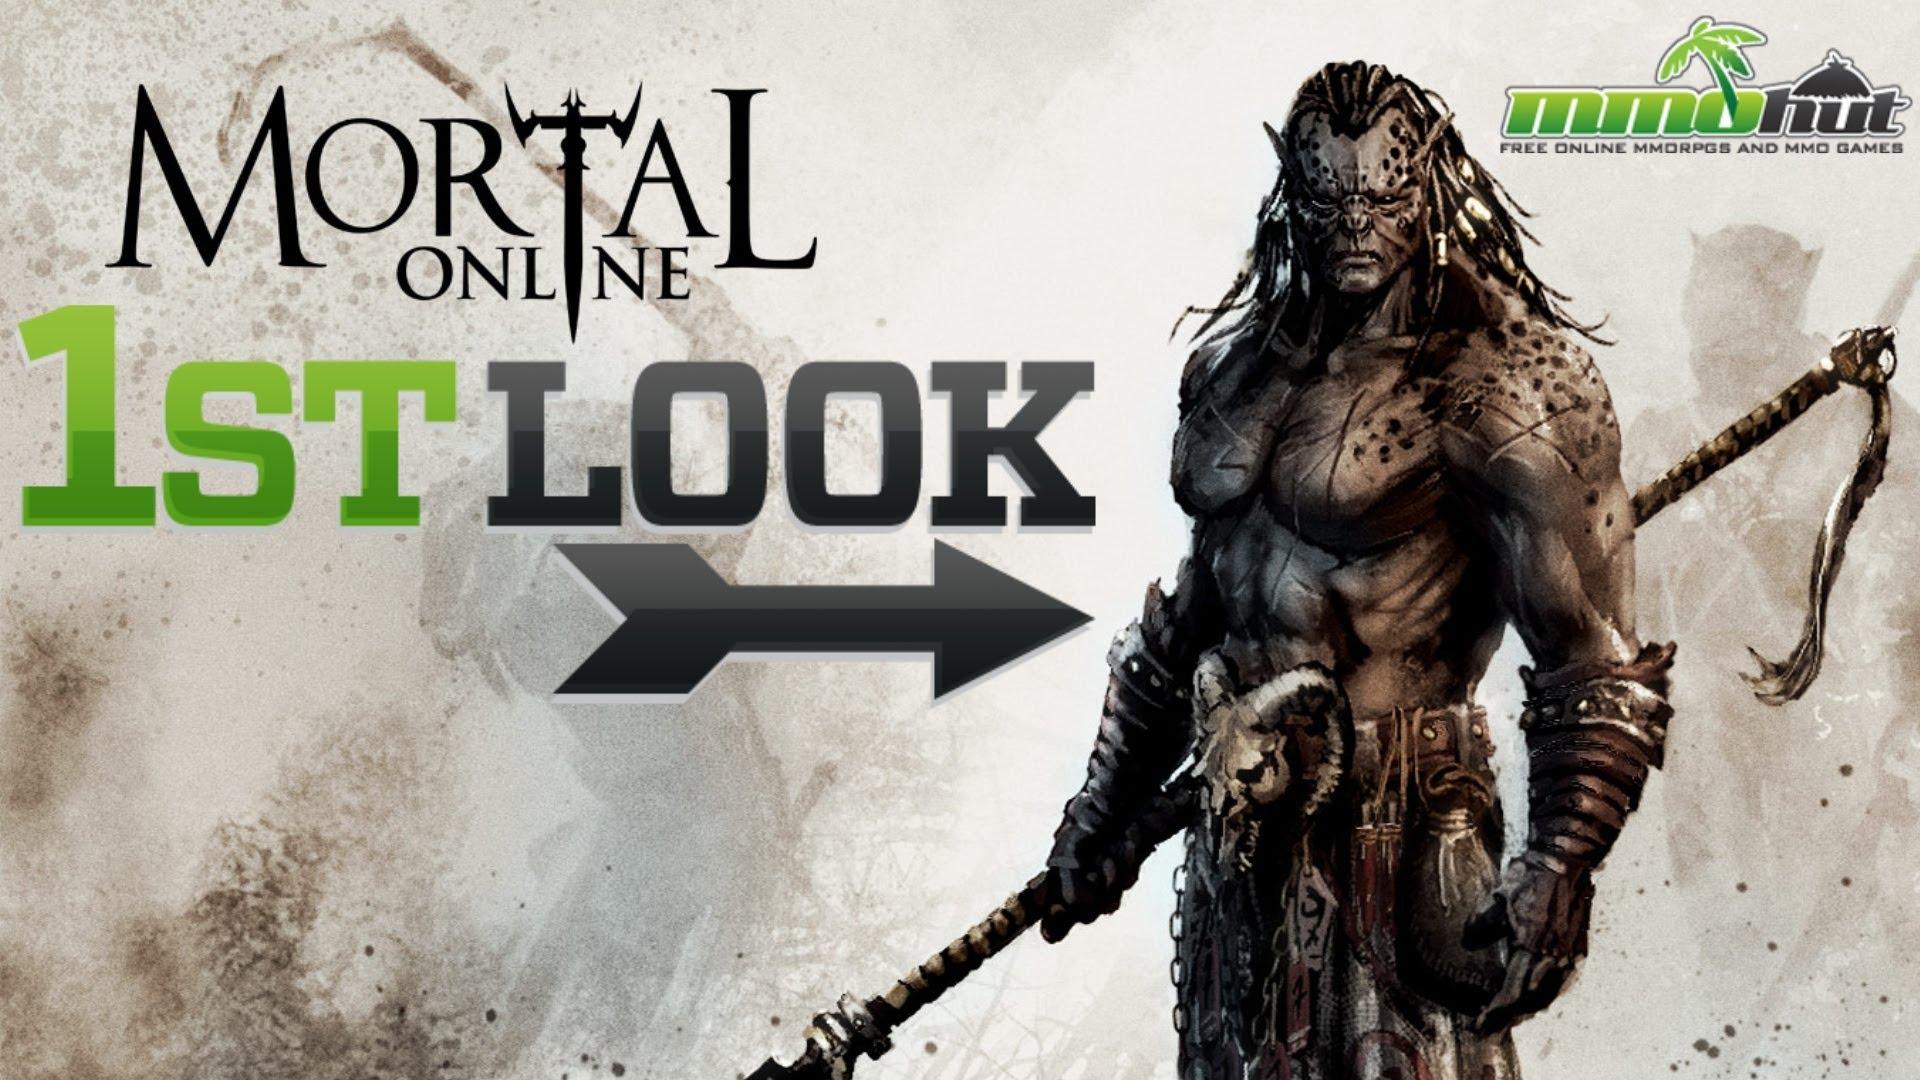 Mortal Online - First Look Video Thumbnail